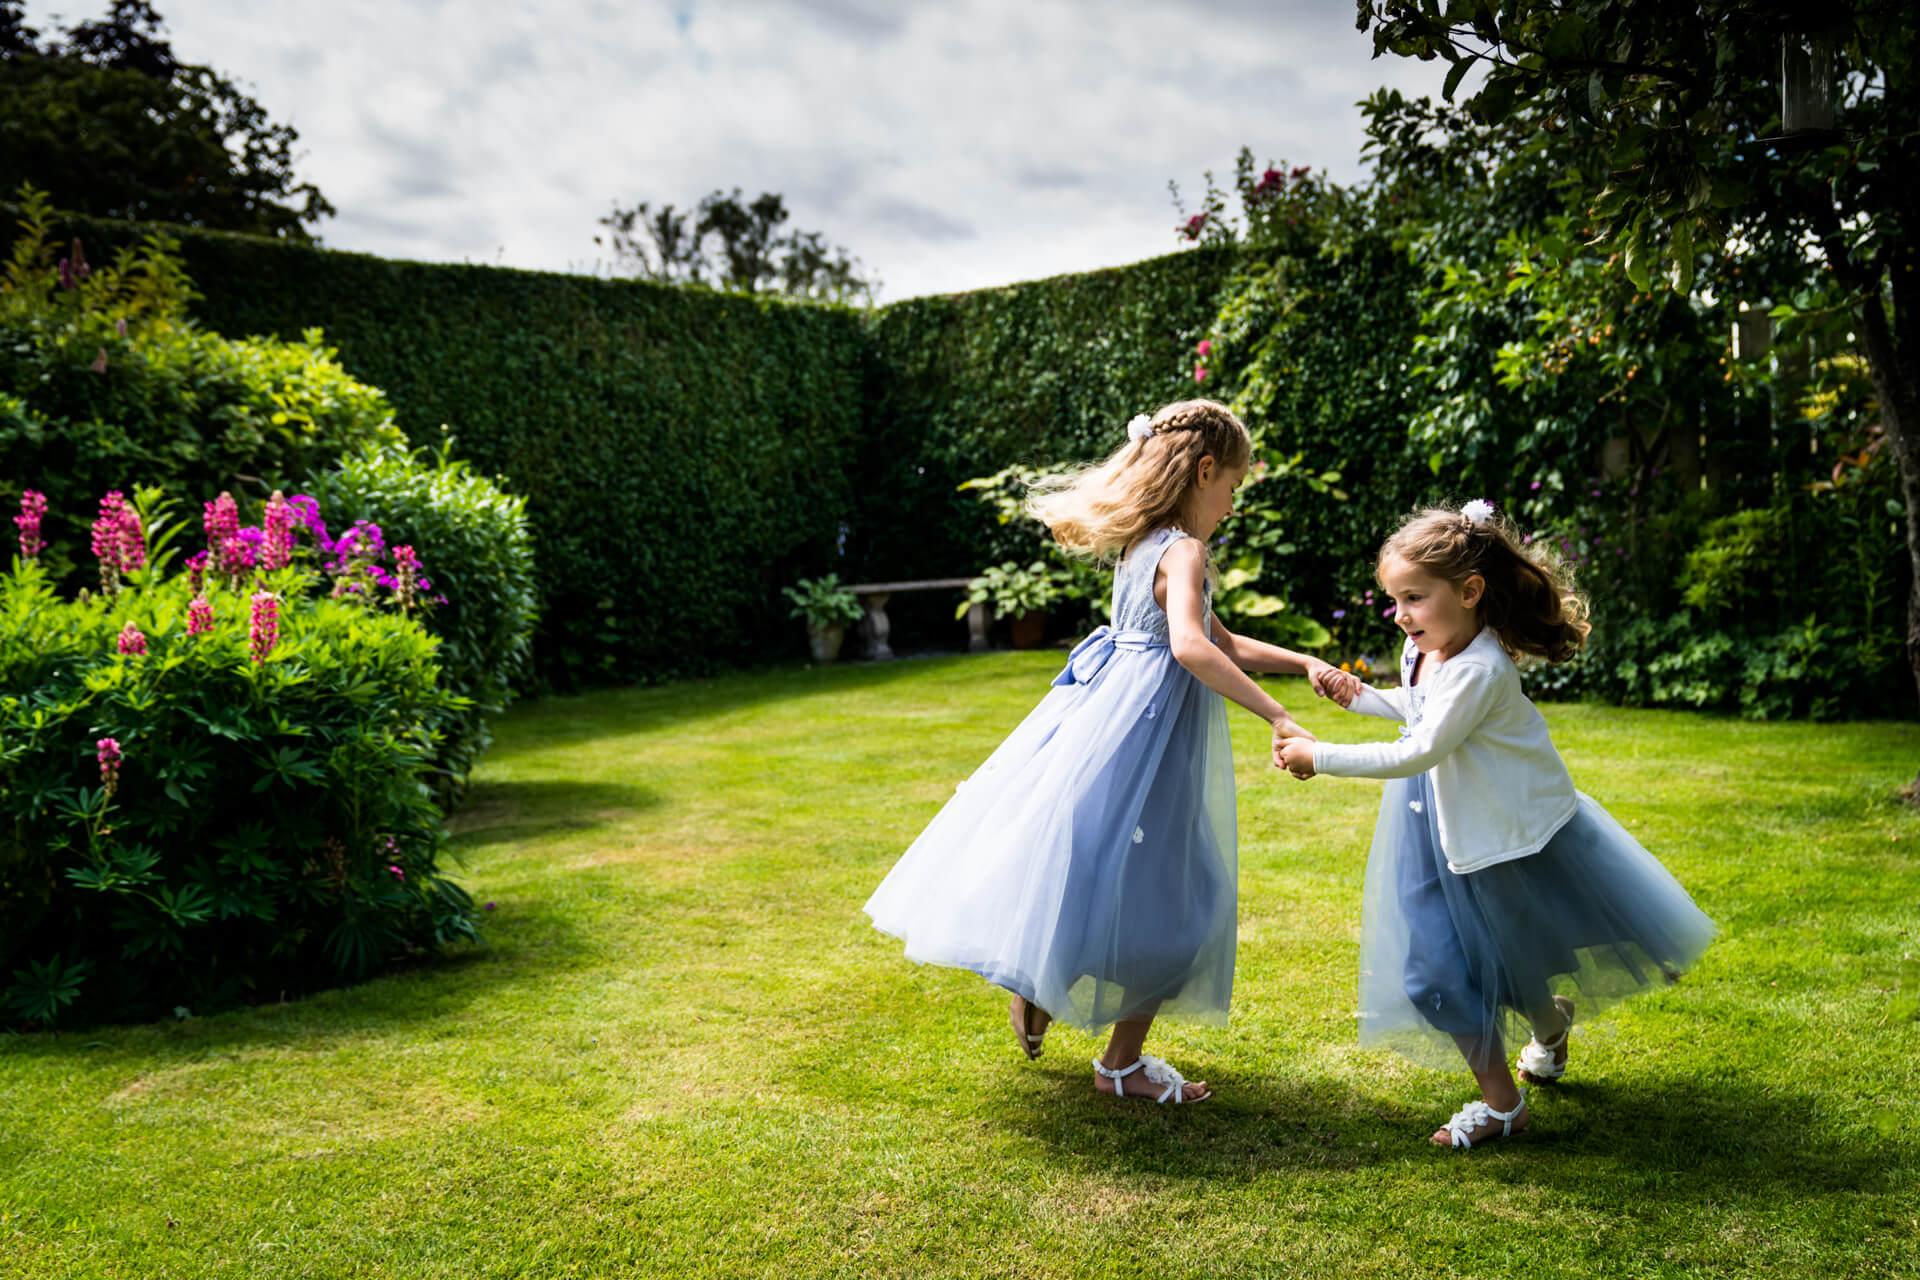 flower girls dancing together in a their garden